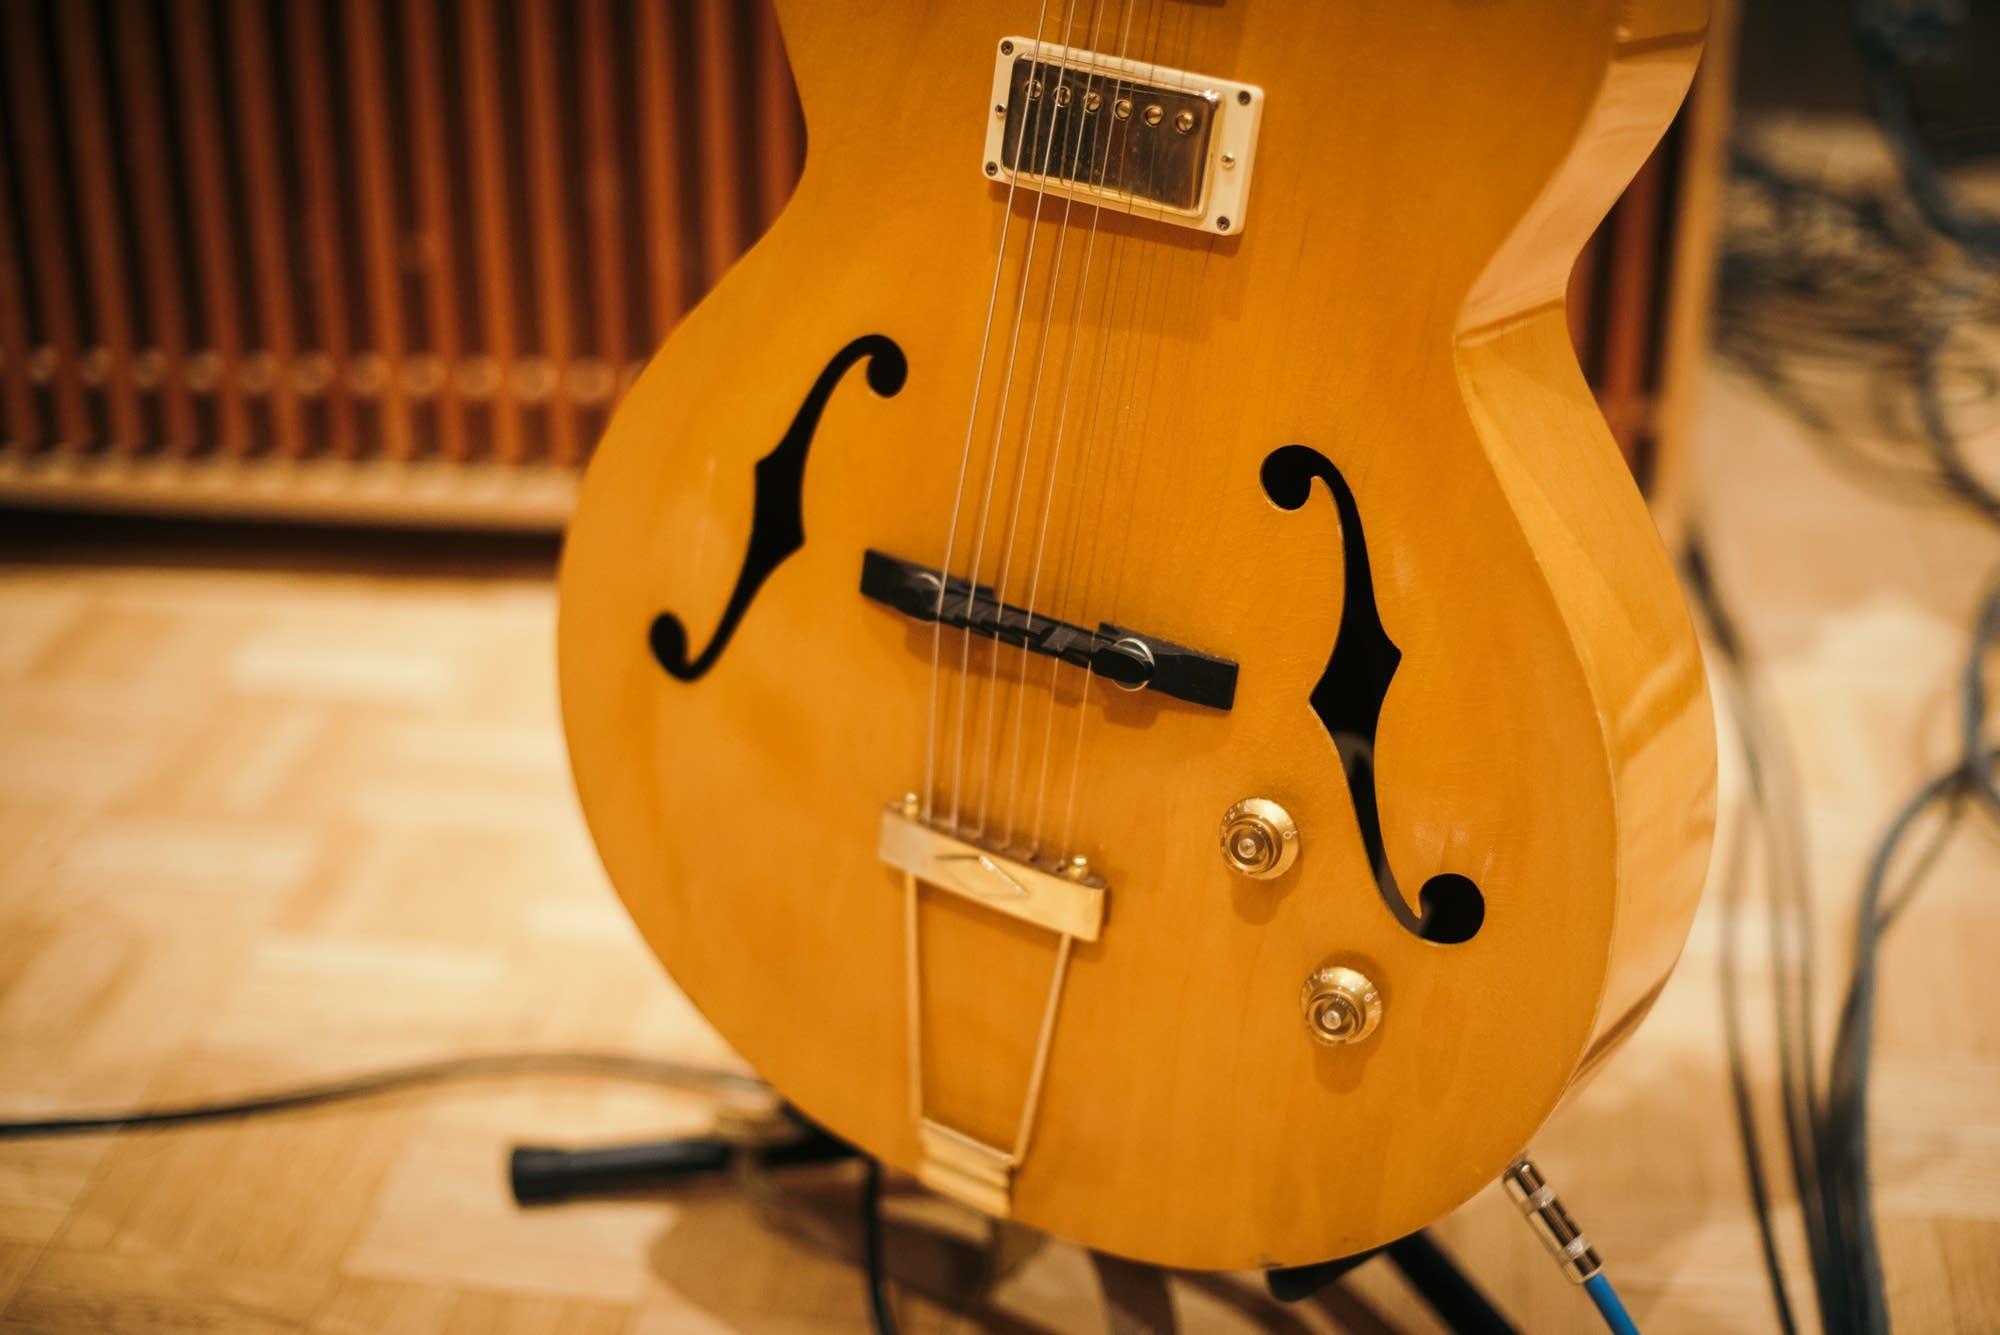 Alynda Segarra's 1950s archtop guitar